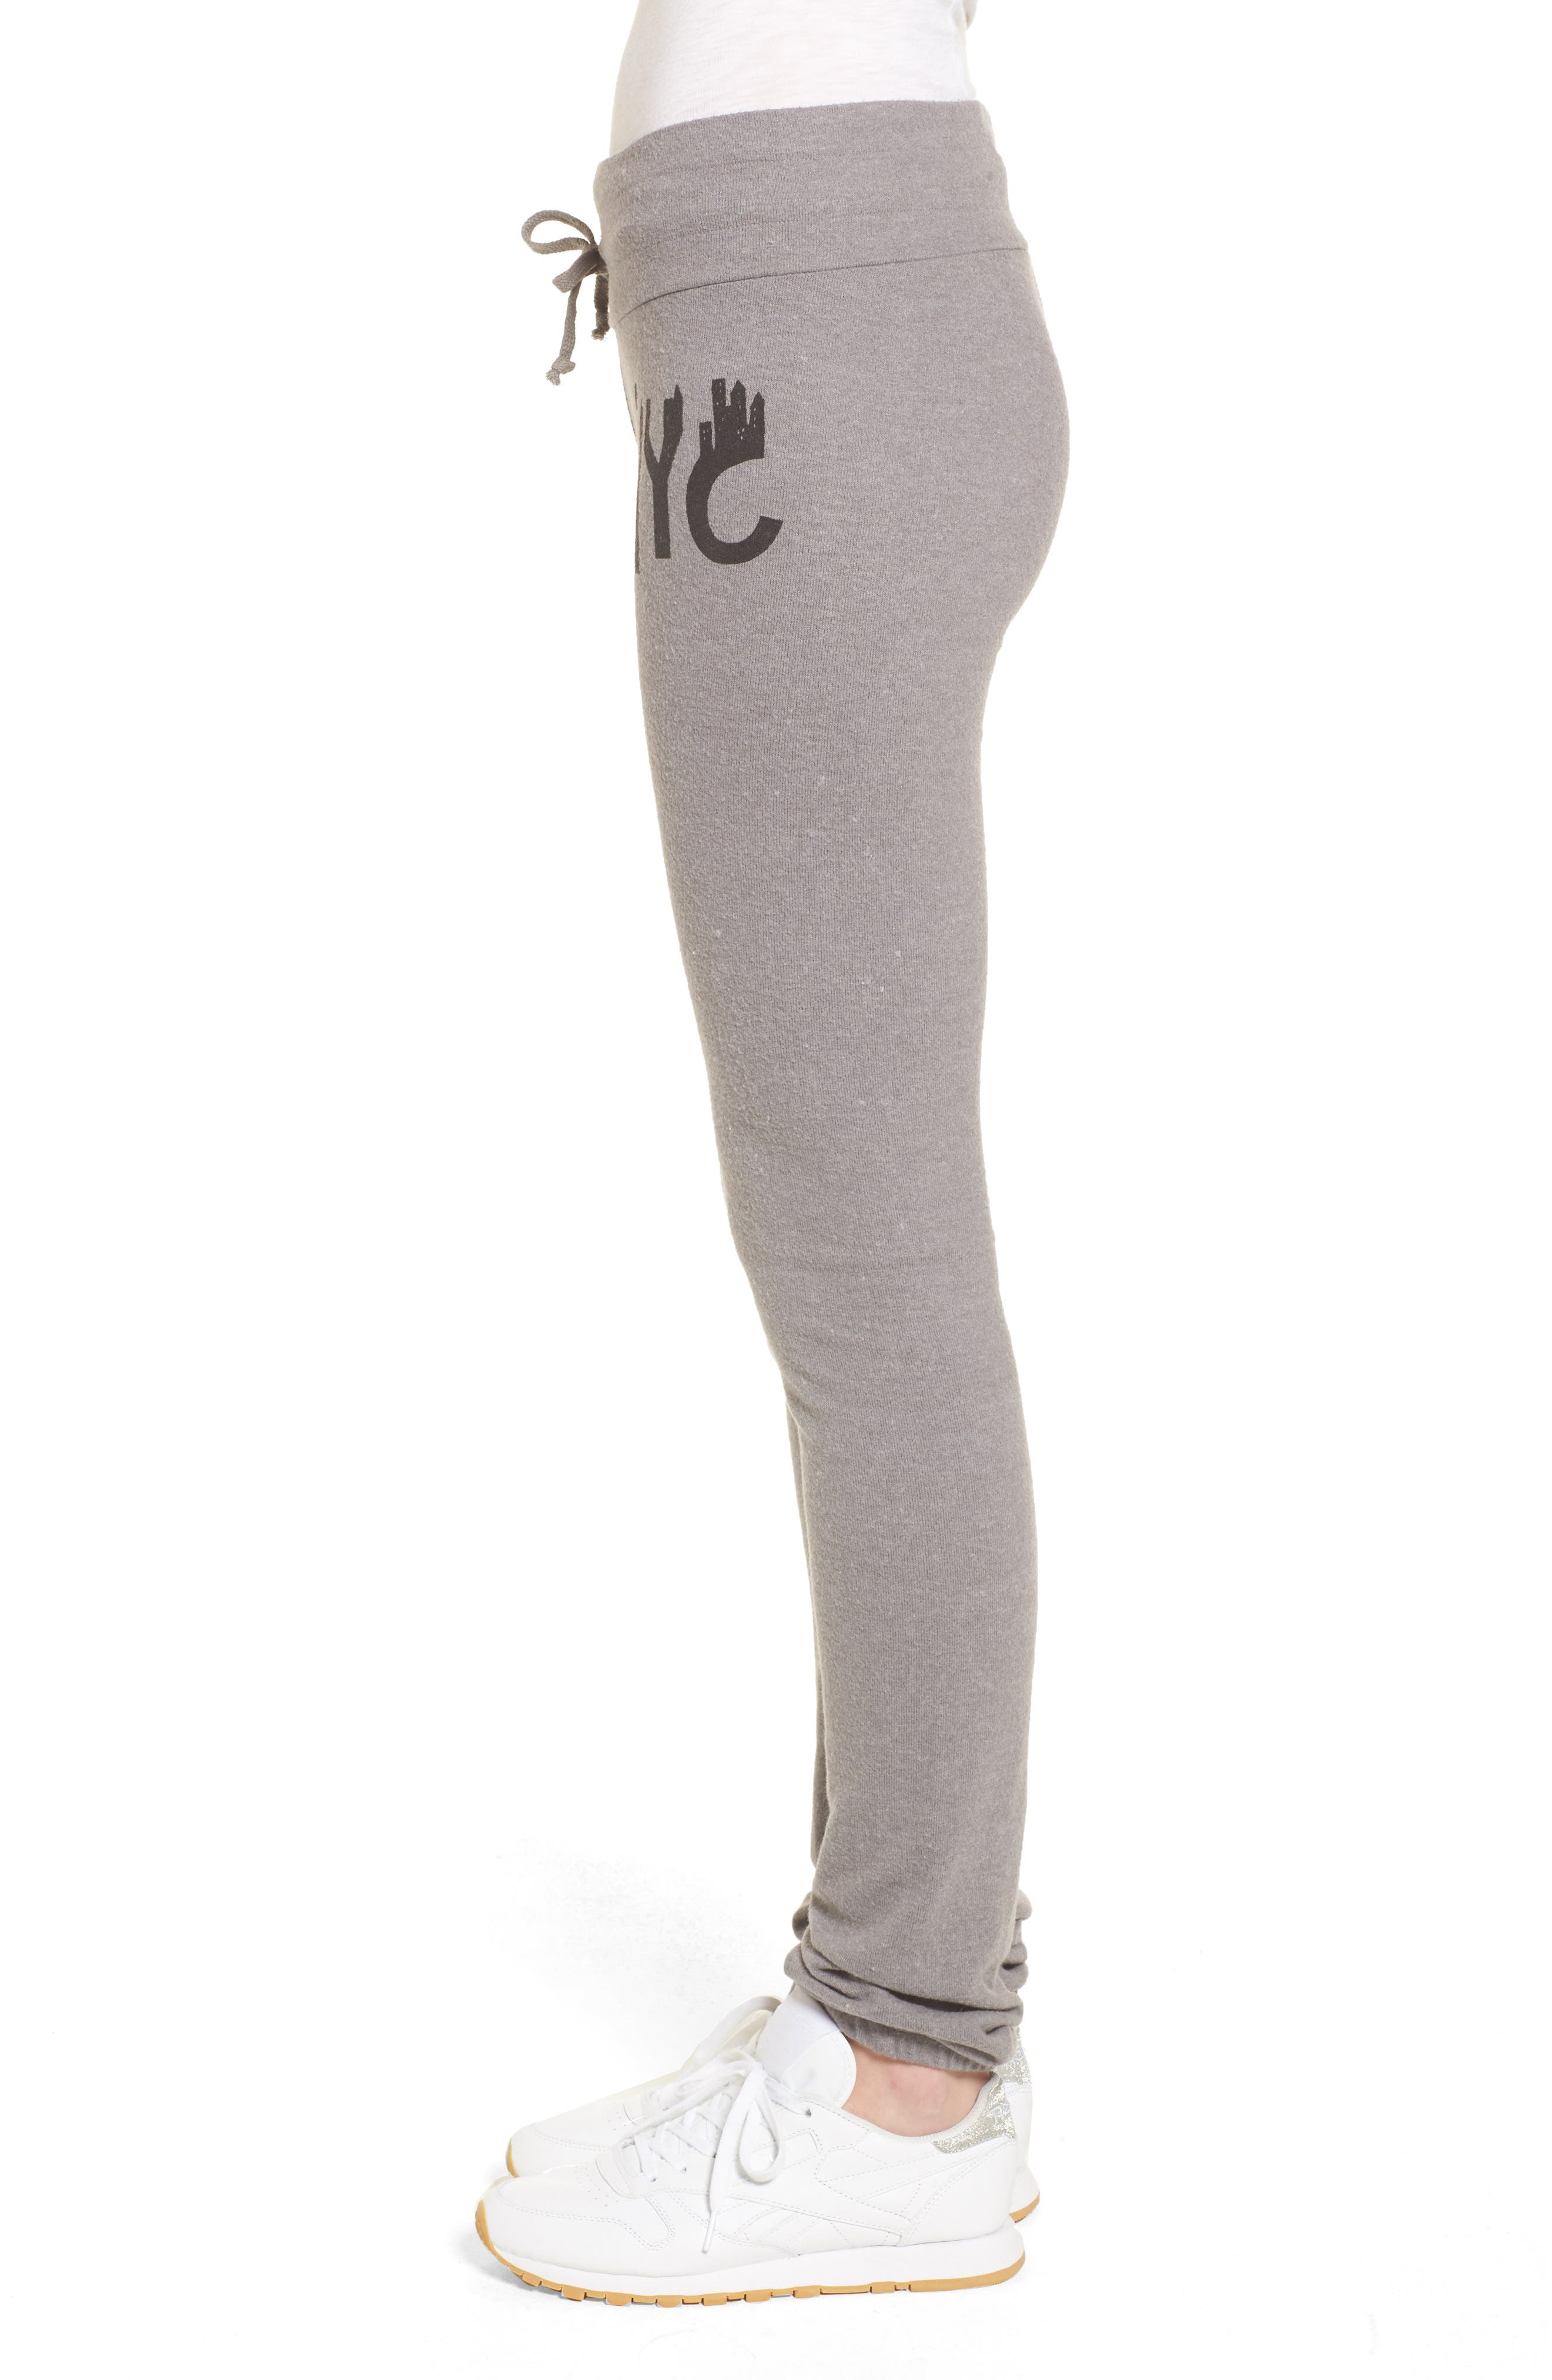 NYC Sweatpants,                             Alternate thumbnail 3, color,                             Vintage Grey